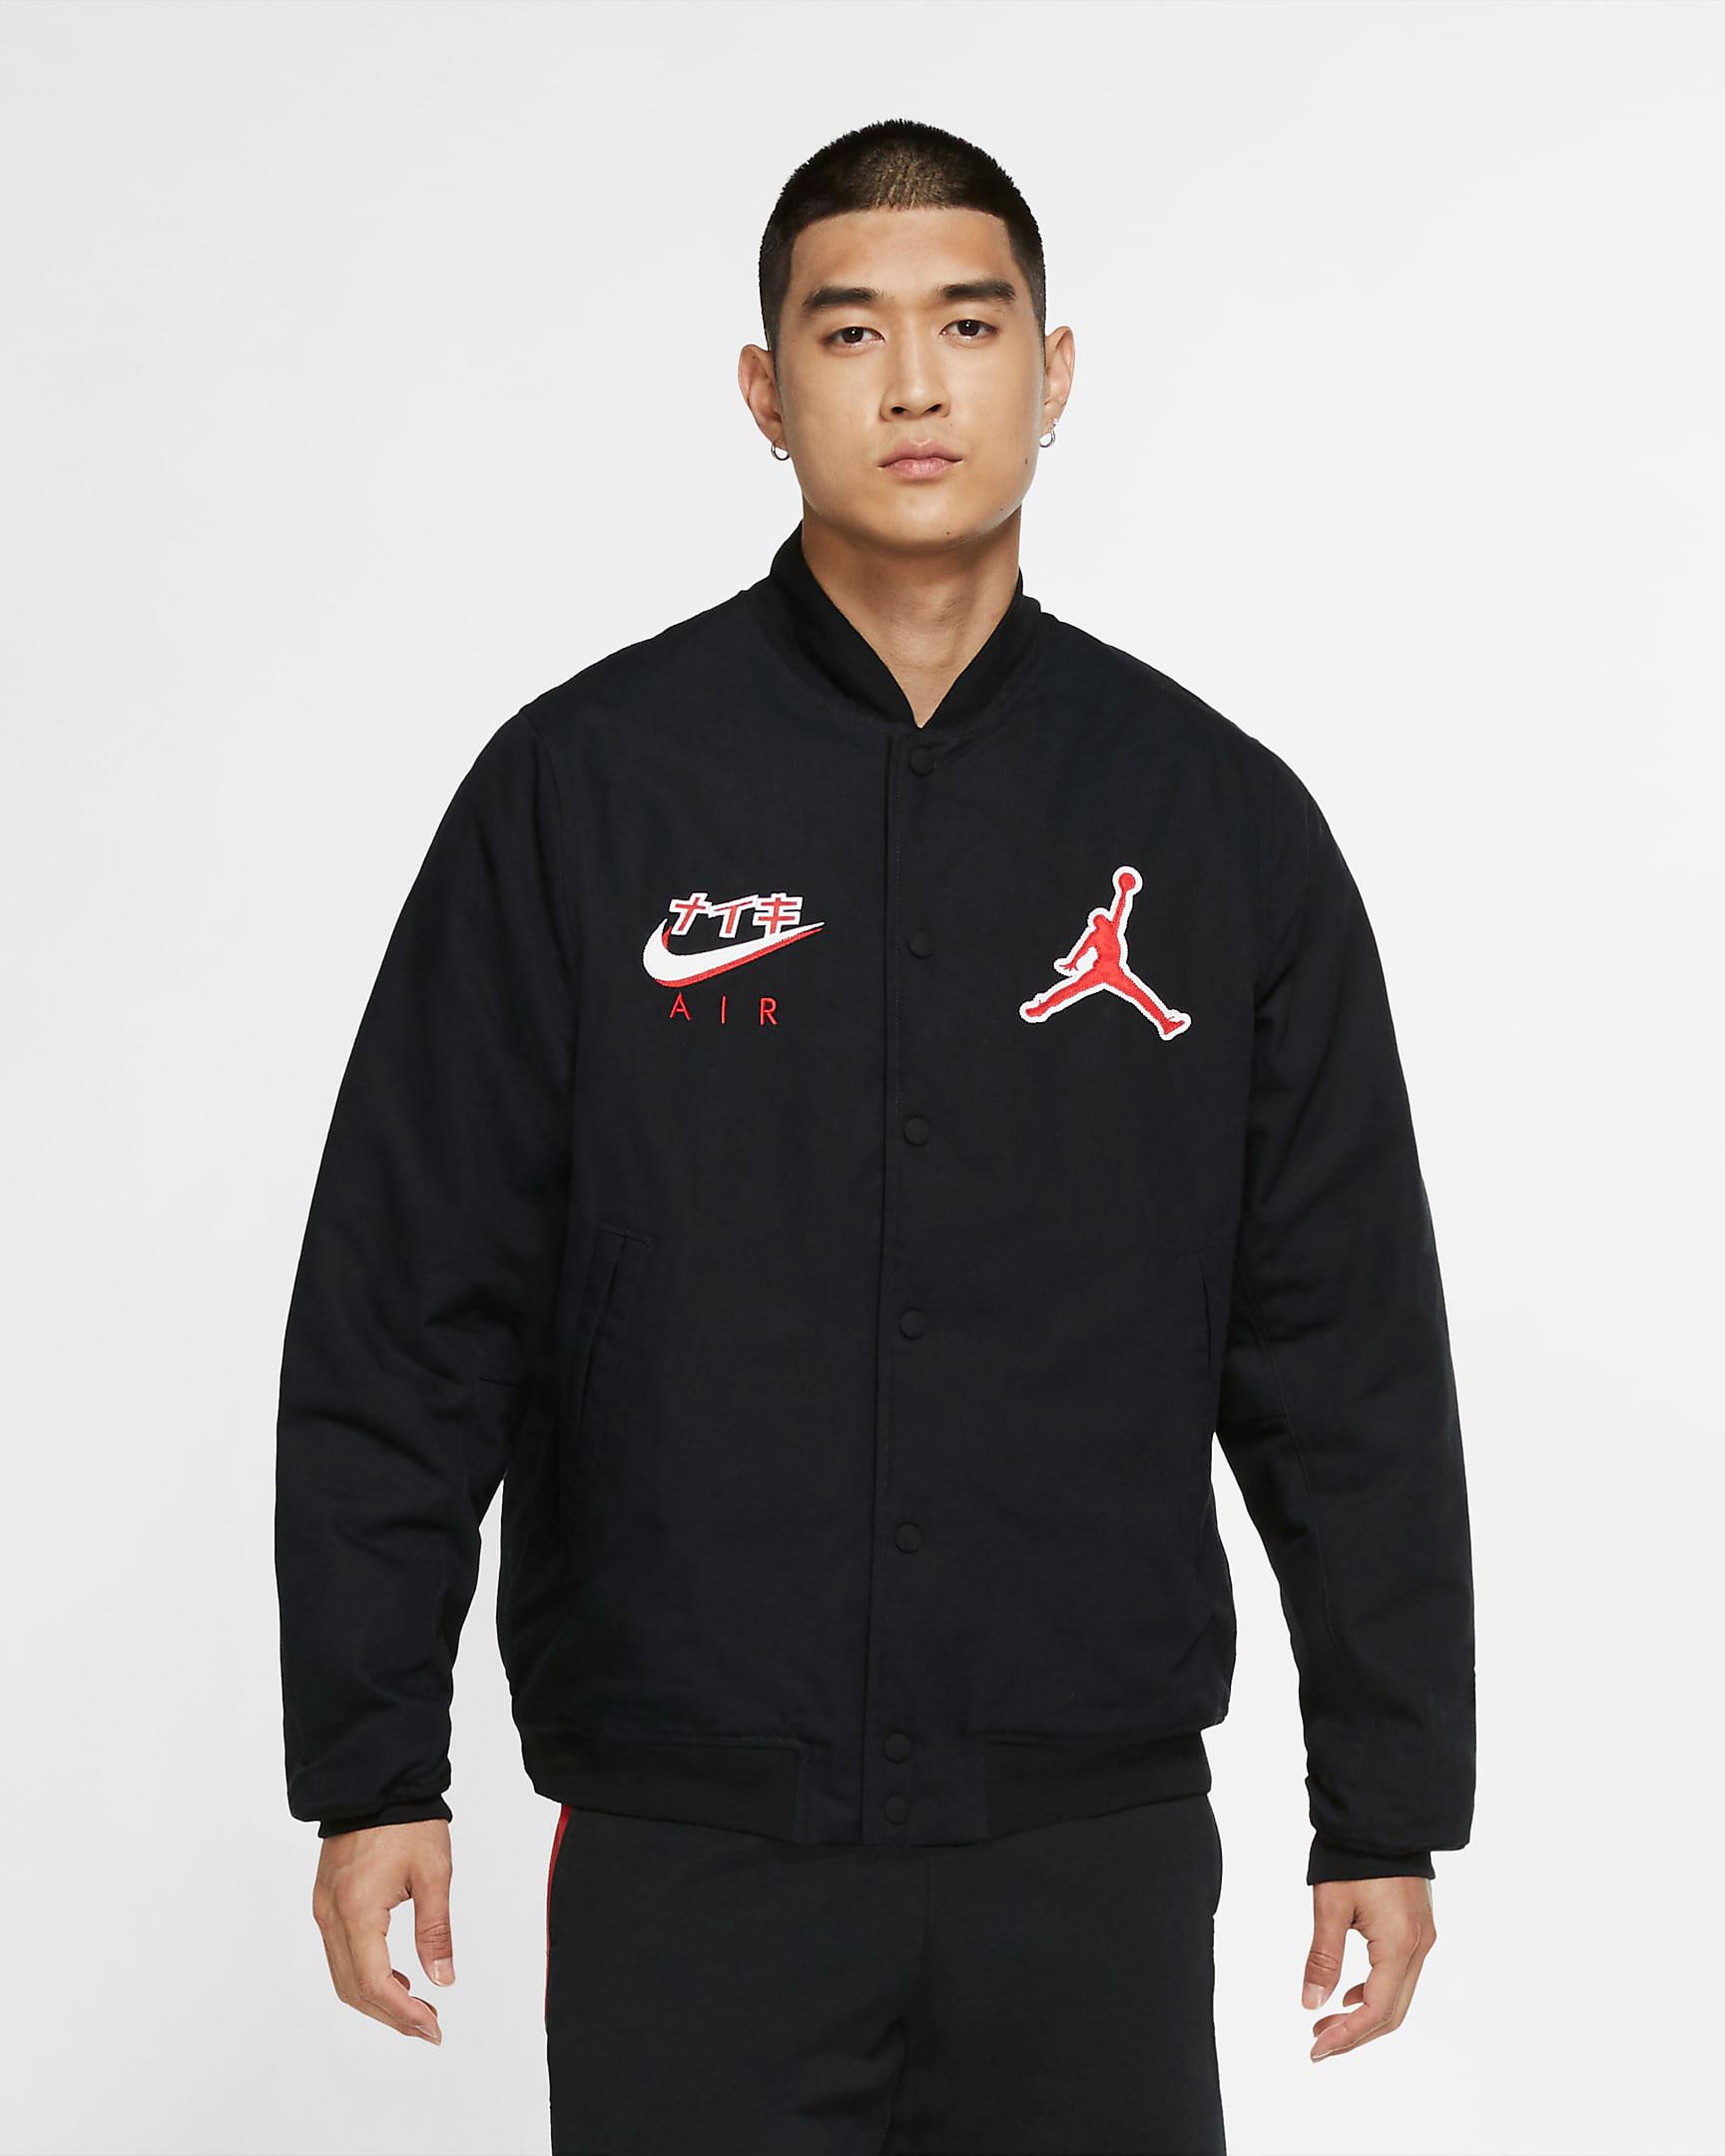 air-jordan-3-denim-fire-red-japan-jacket-1